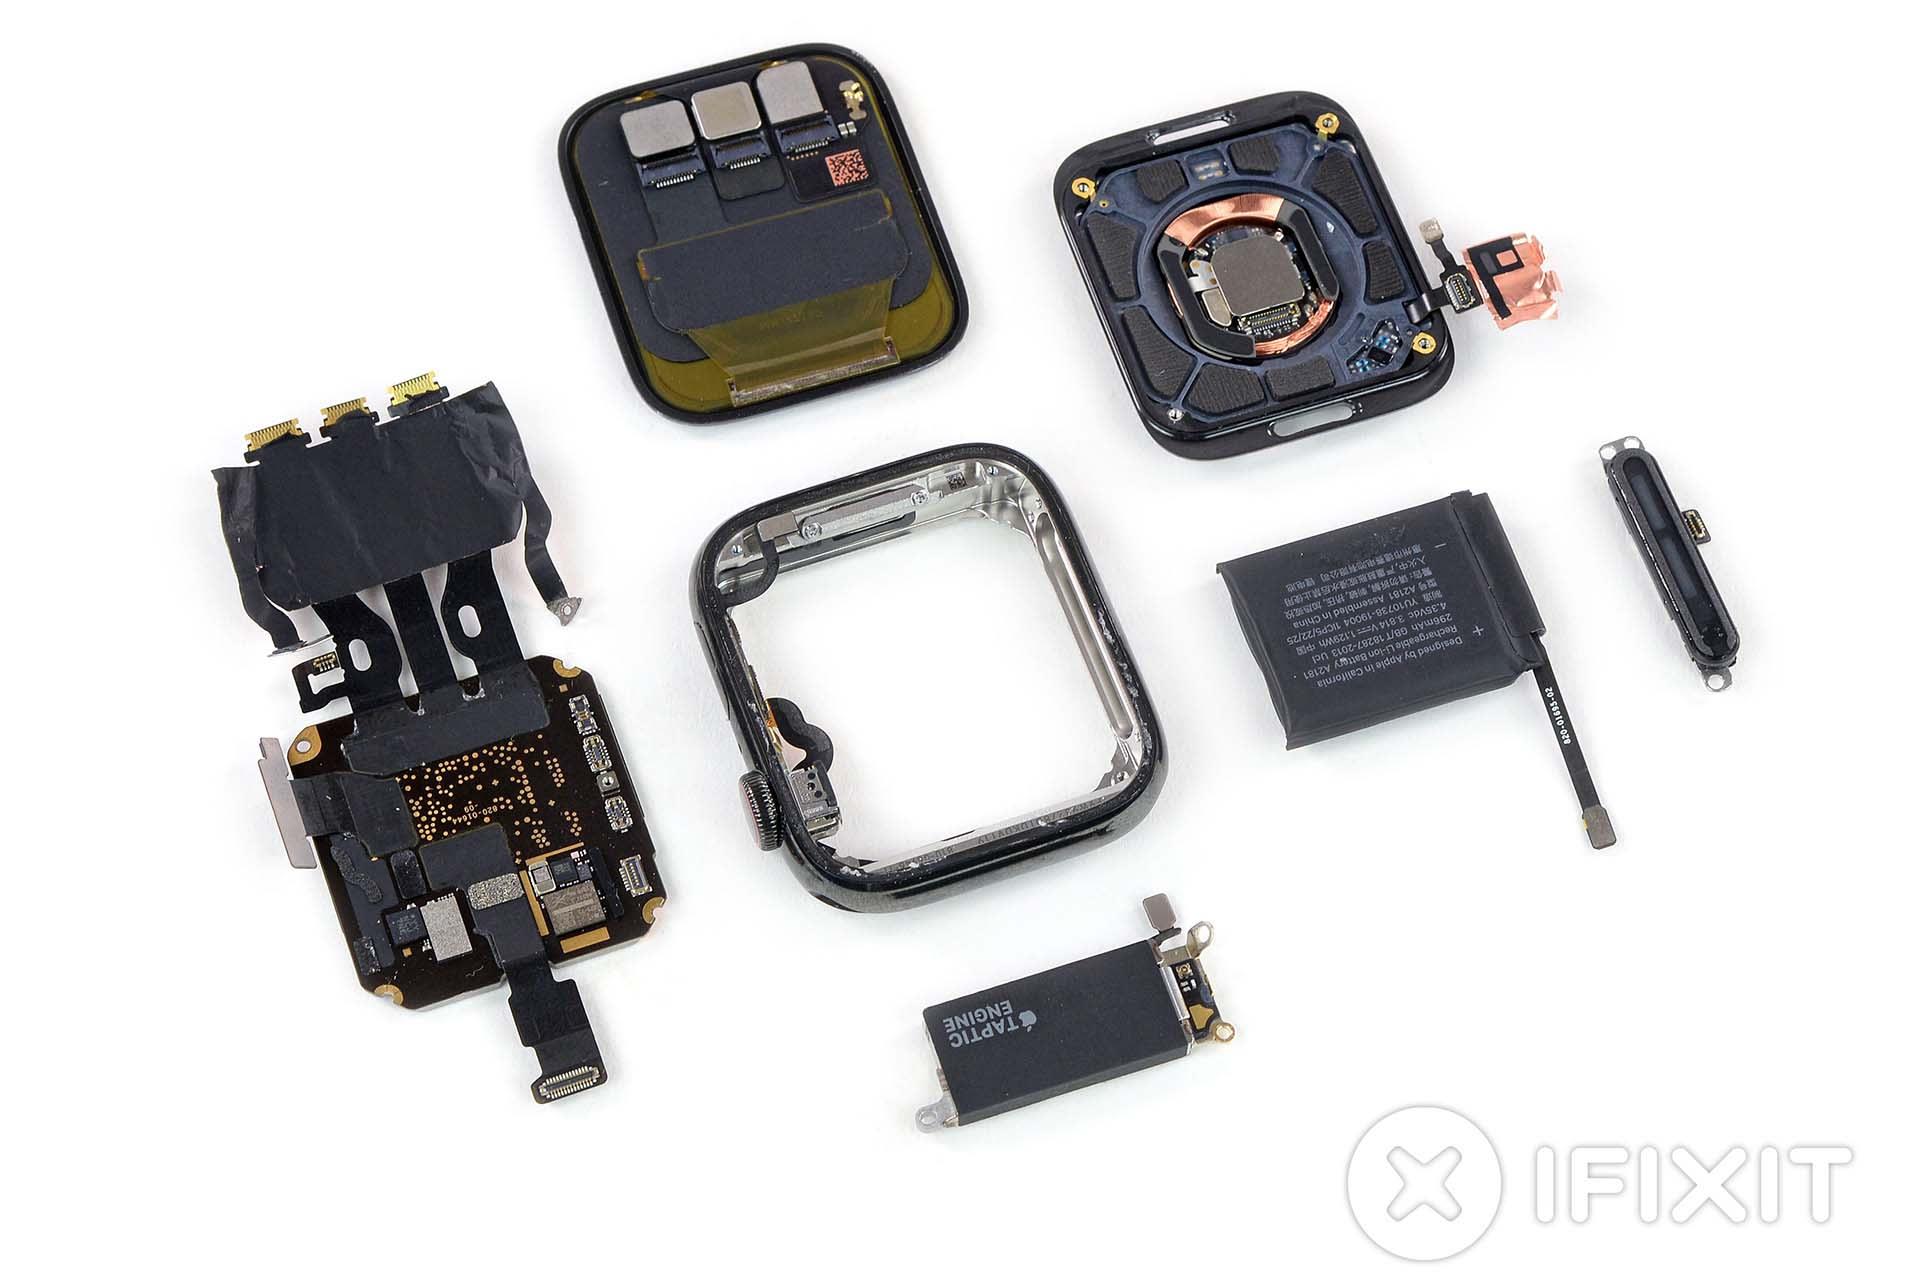 iFixitがApple Watch Series 5を分解。Series 4とほぼ同じながら細かな変更 - Engadget Japanese